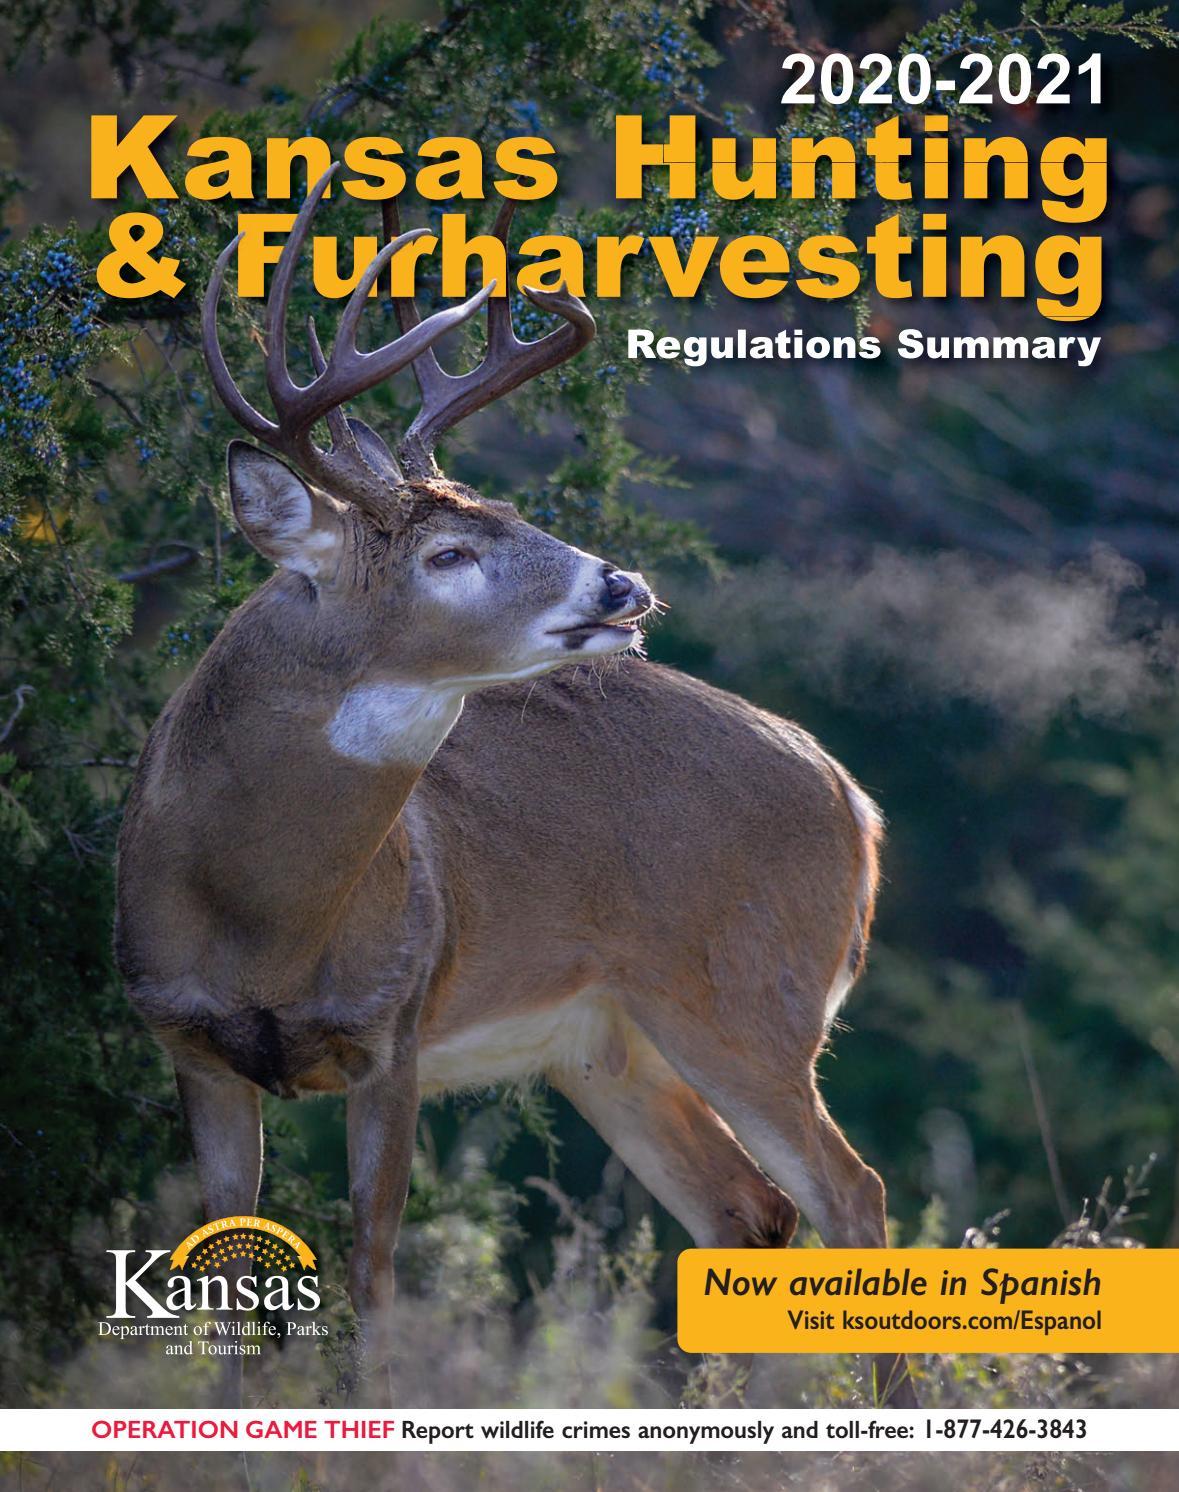 2020-2021 Kansas Hunting & Furharvesting Regulations Summary with 2021 Deer And Deer Hunting Rut Calendar